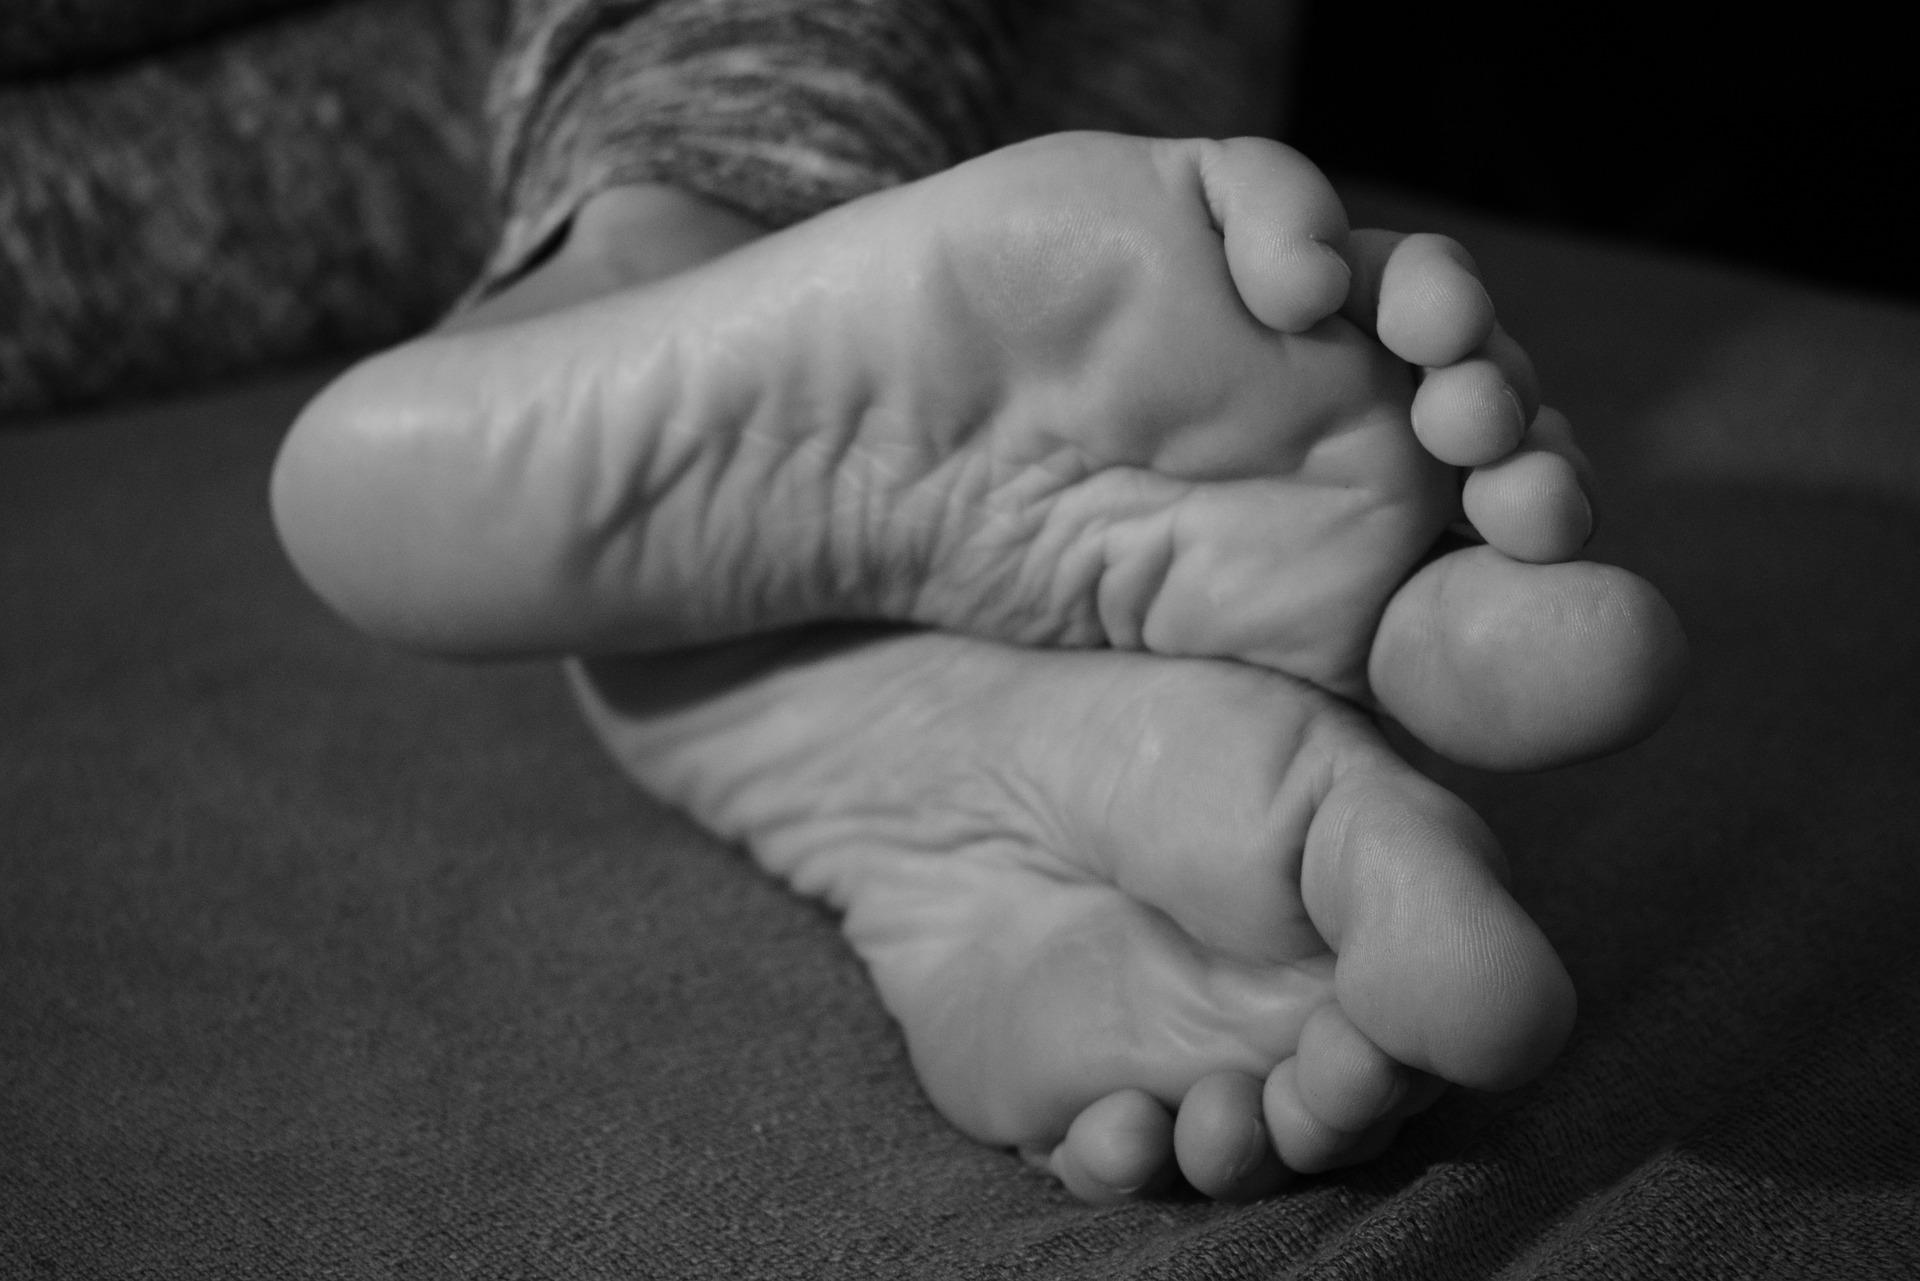 feet-2908582_1920